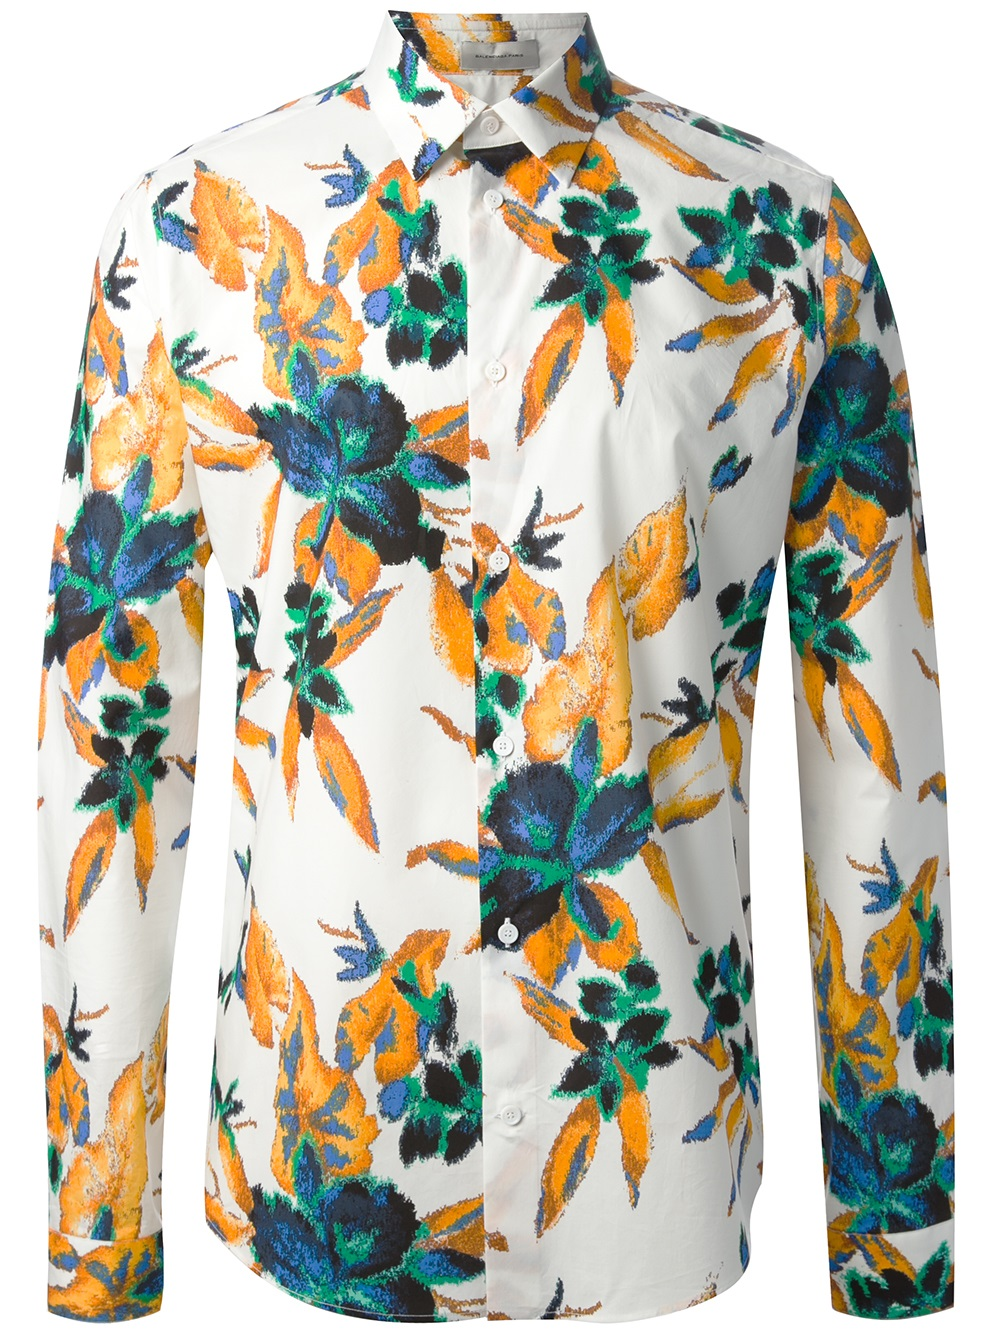 fe504d00b8dc Lyst - Balenciaga Floral Print Shirt for Men